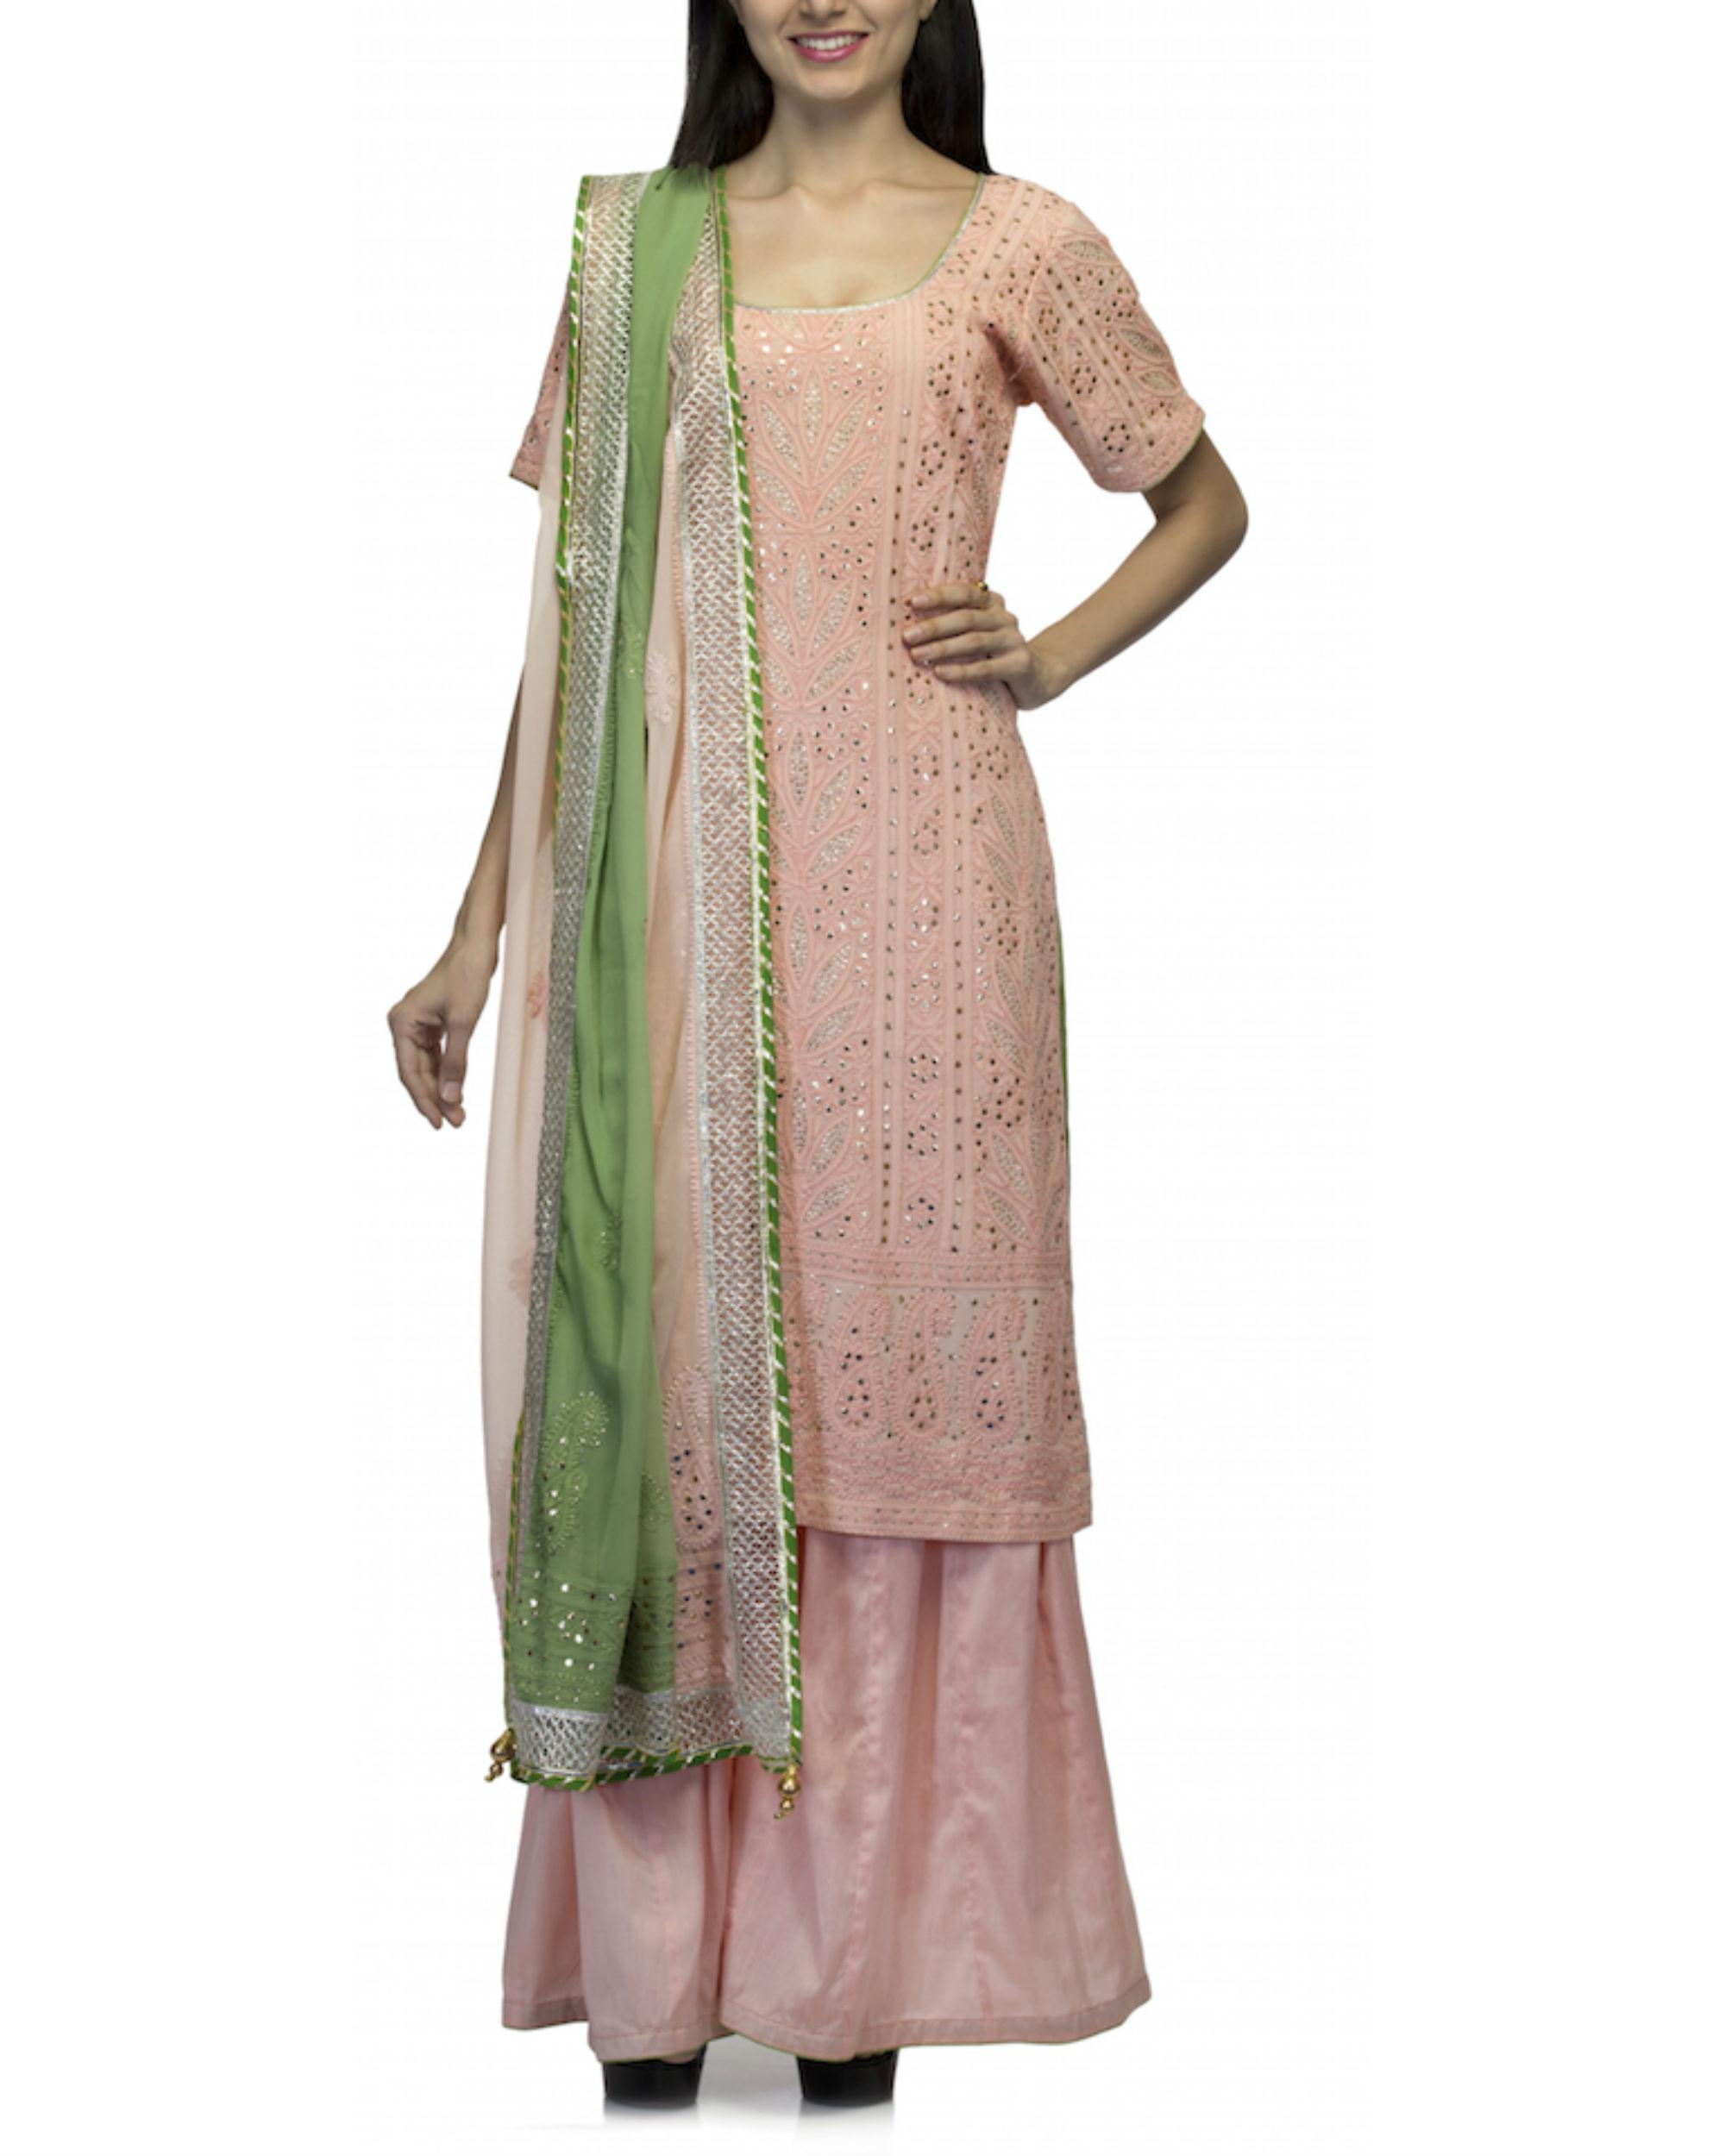 Pink kurta set with green dupatta